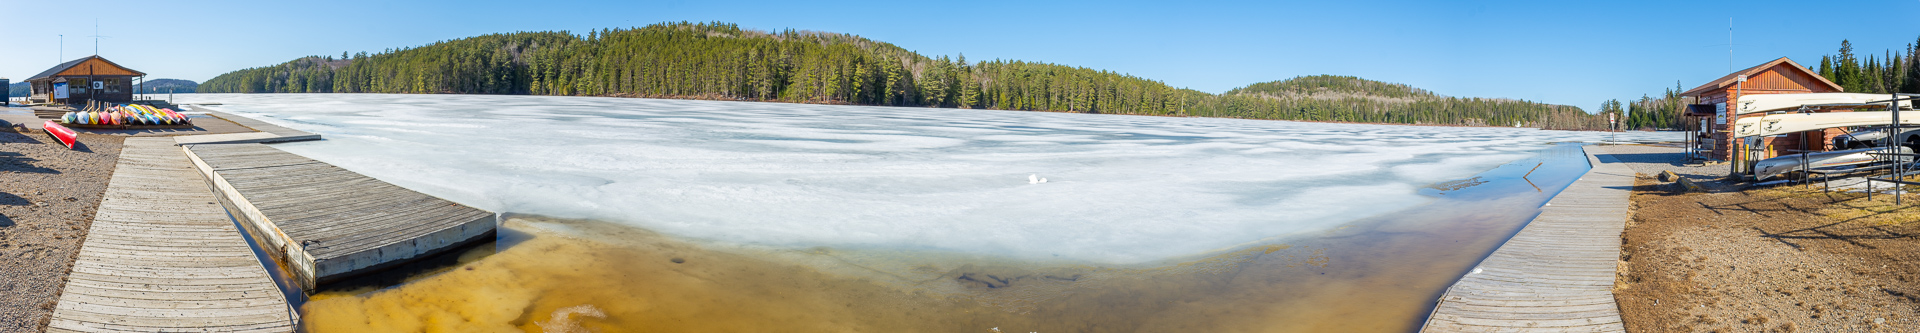 Lake Opeongo, Algonquin Park